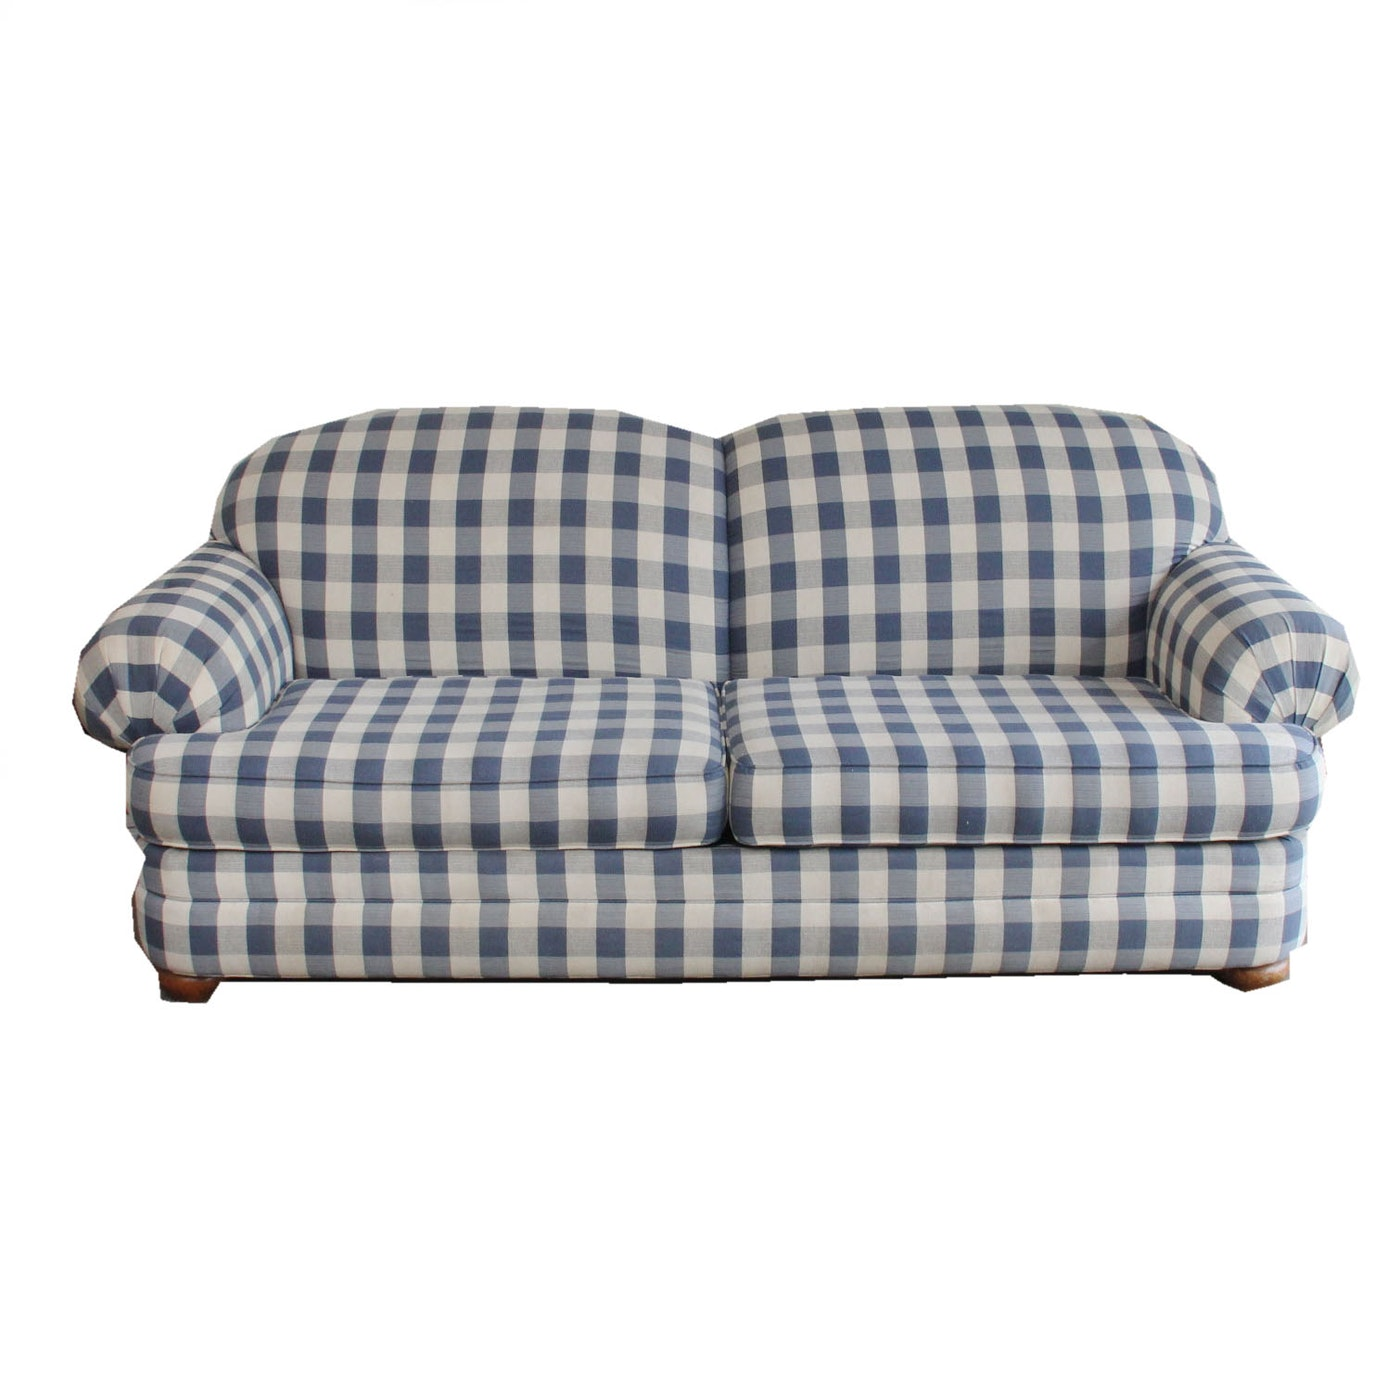 Broyhill blue and white plaid sleeper sofa ebth for Blue and white sofa